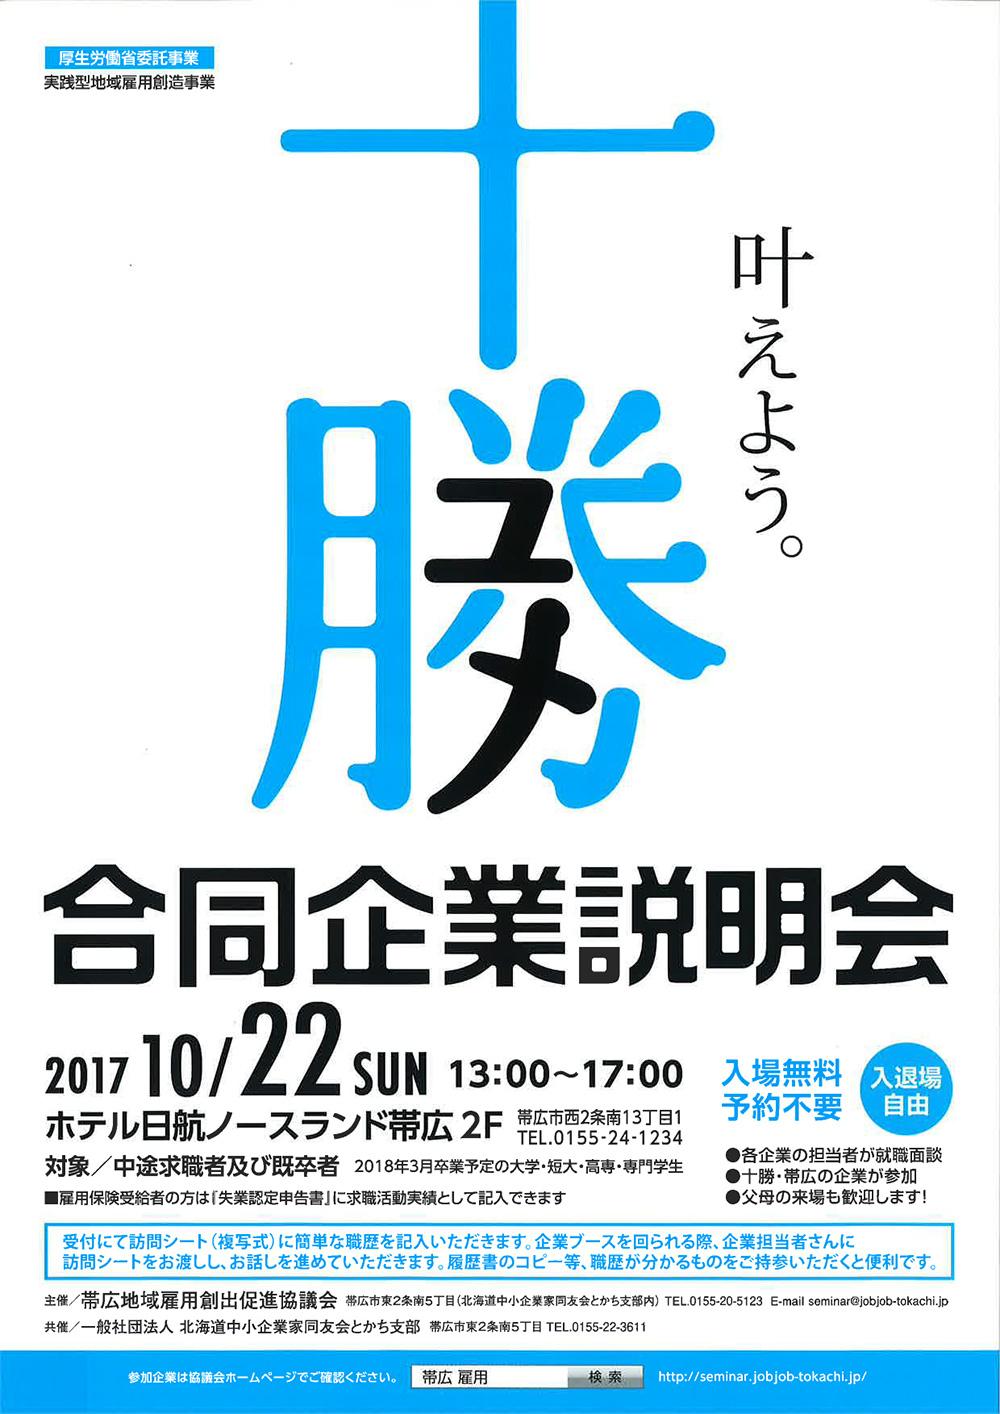 http://www.netsugen.co.jp/setsubi/information/images/171022goudousetumei.jpg